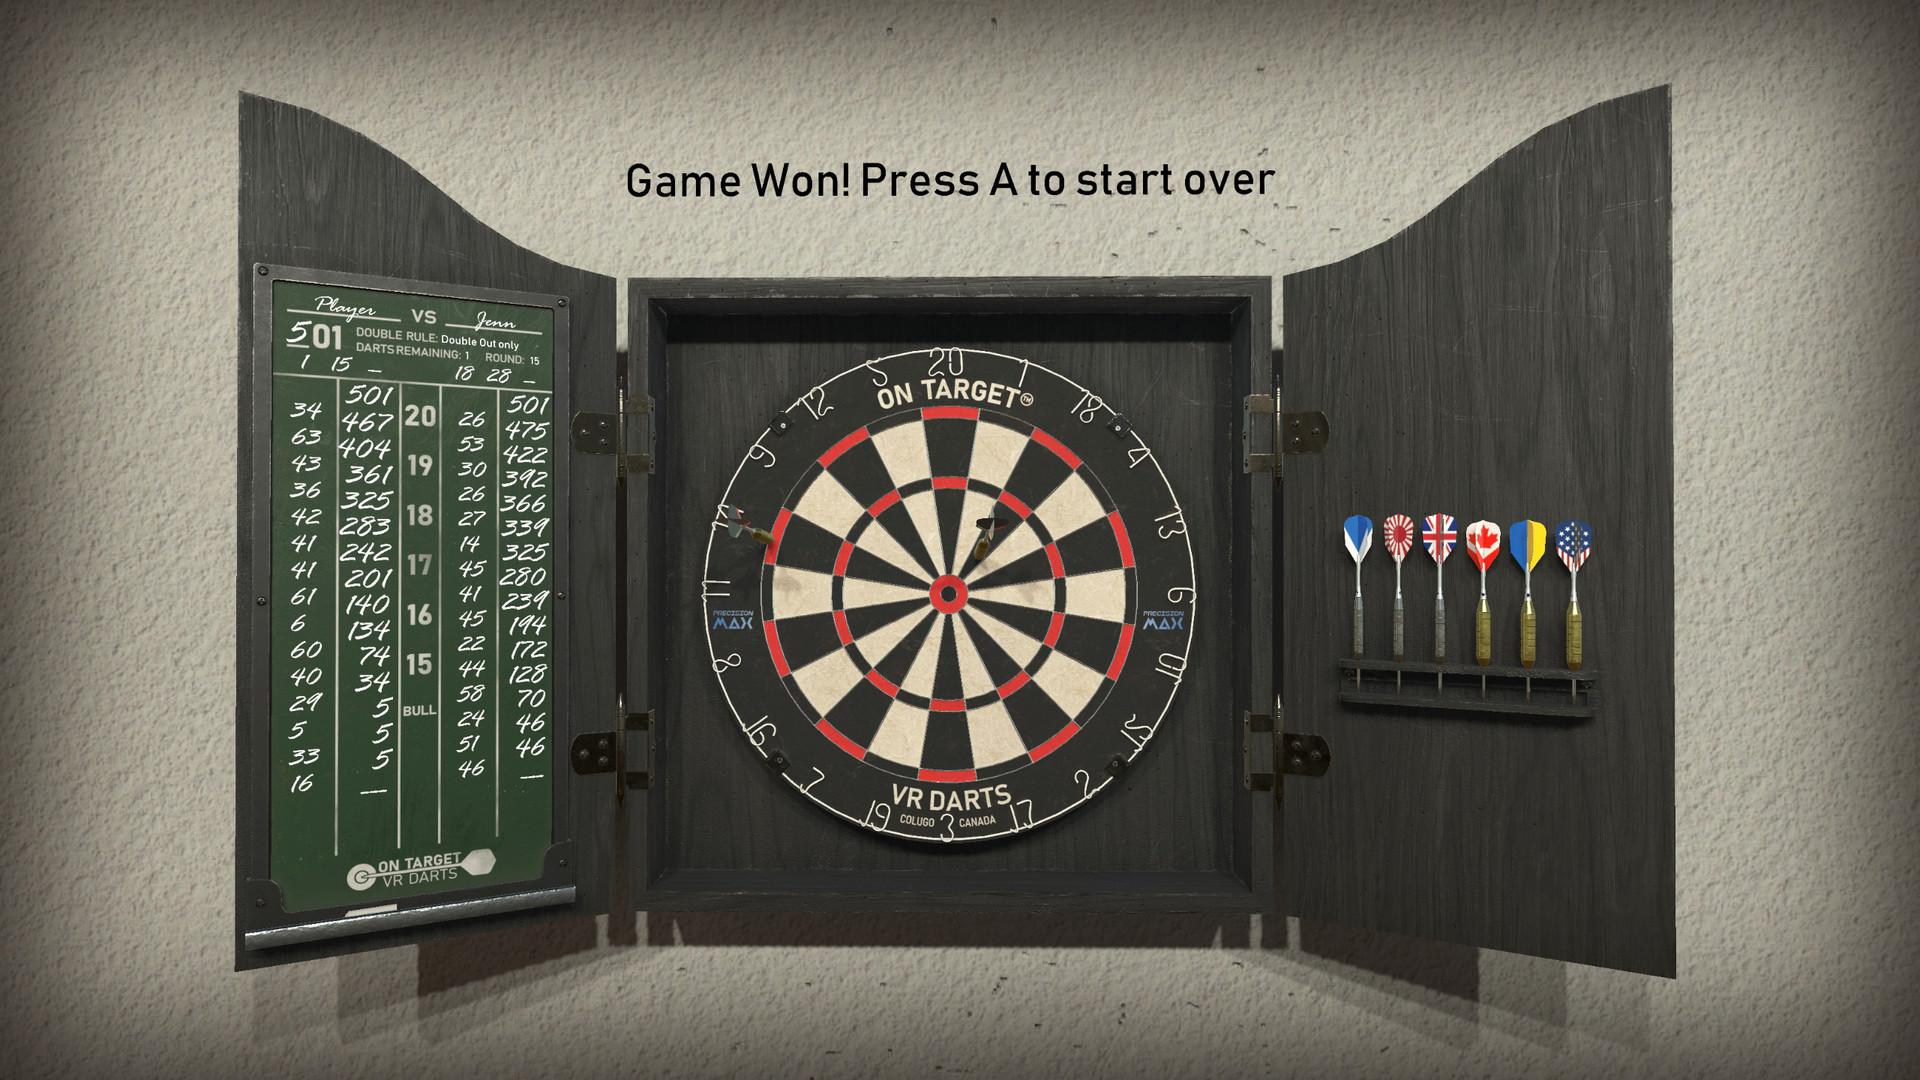 On Target VR Darts Free Download